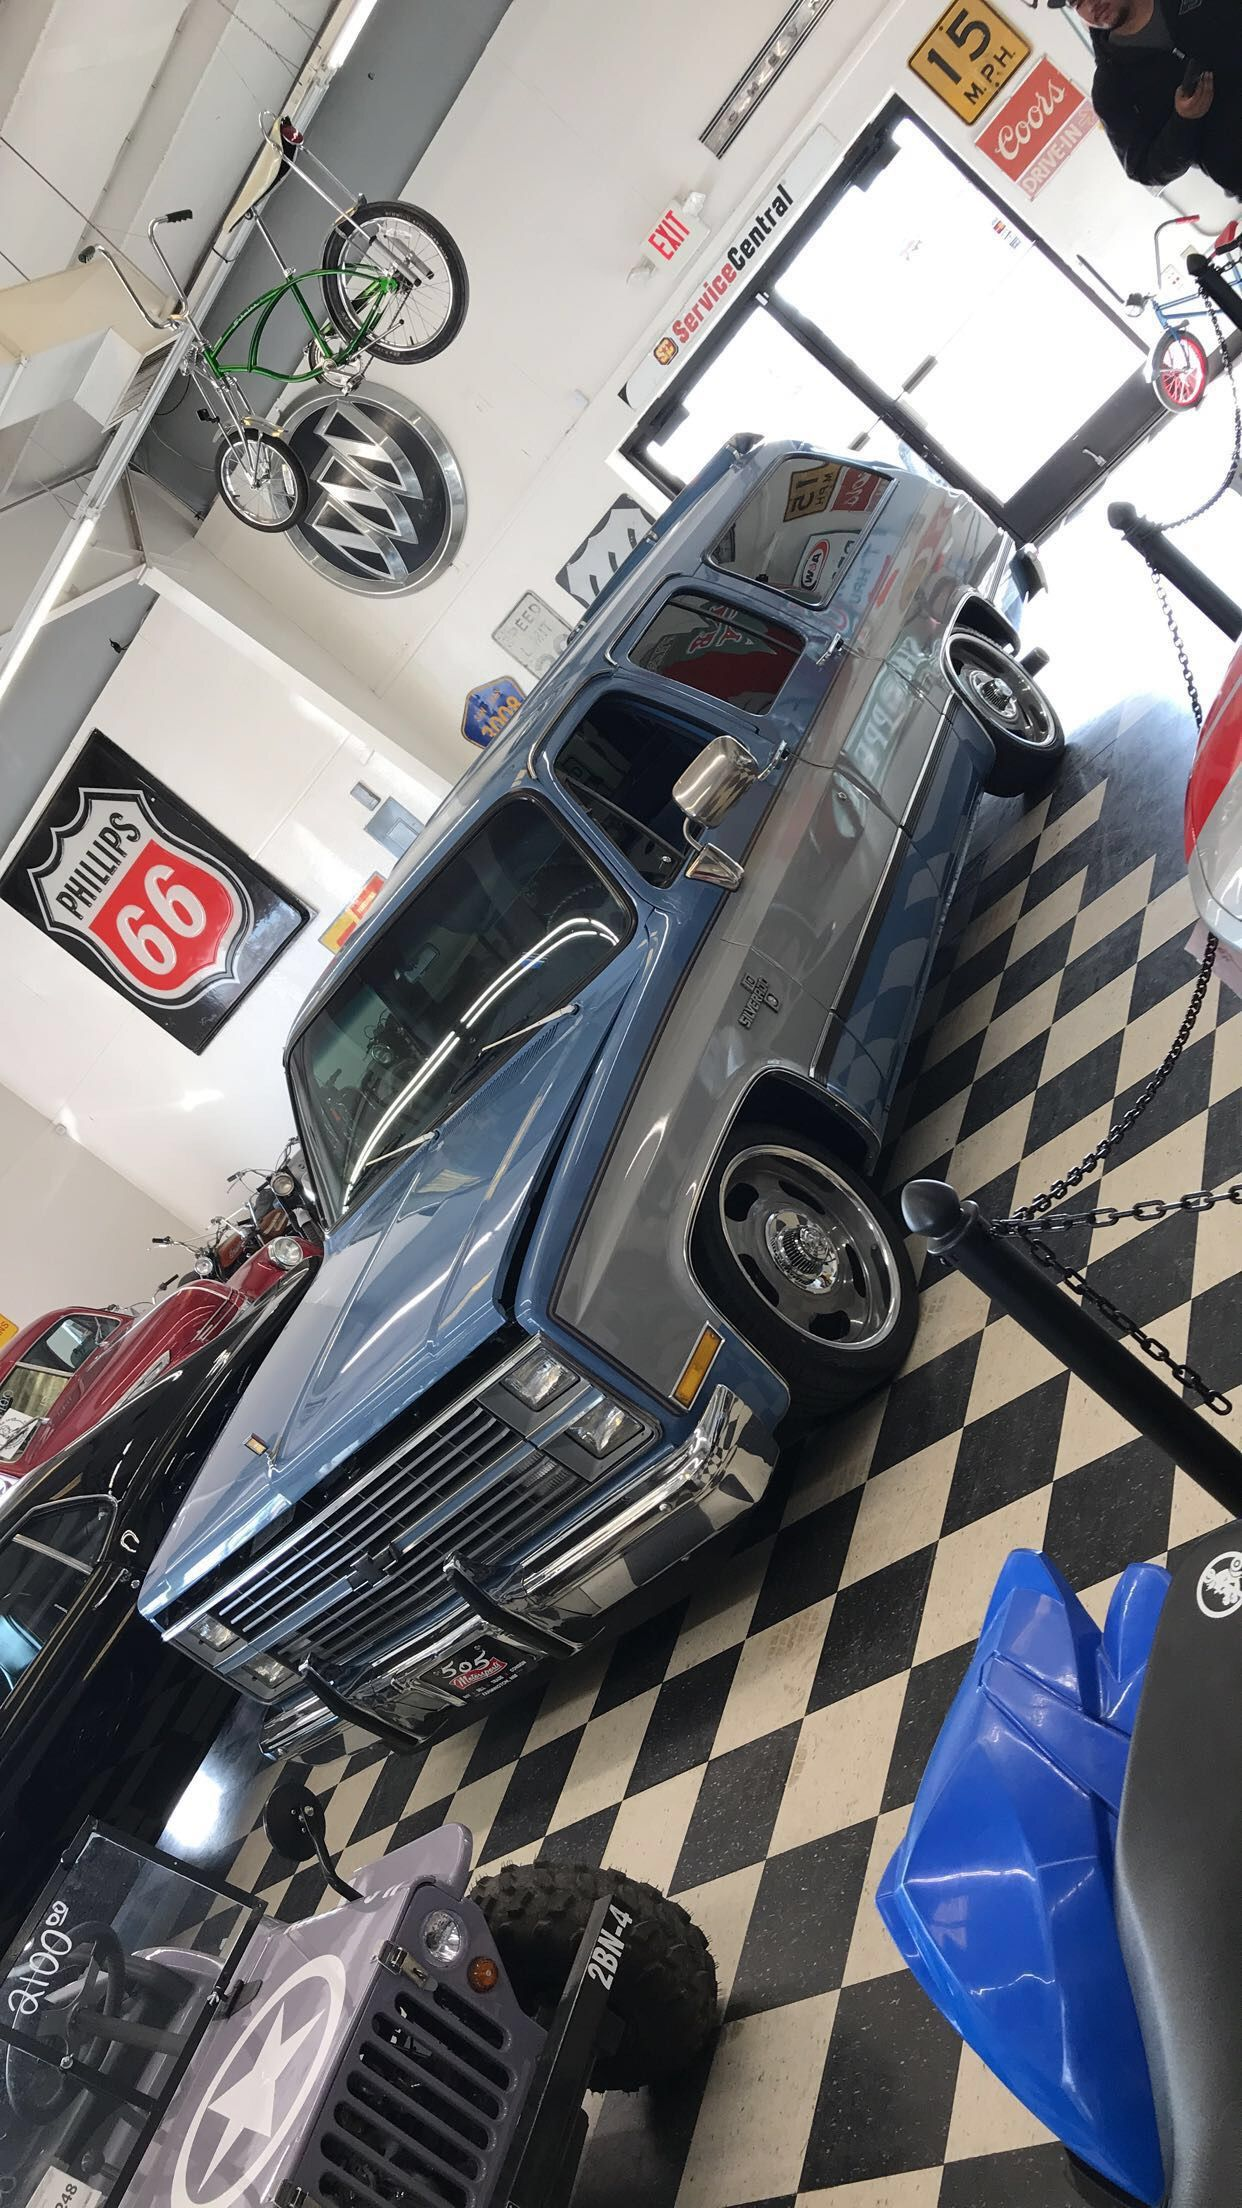 Pin By Justin Darling On Truck N Lowrider Trucks Chevy Suburban Classic Pickup Trucks